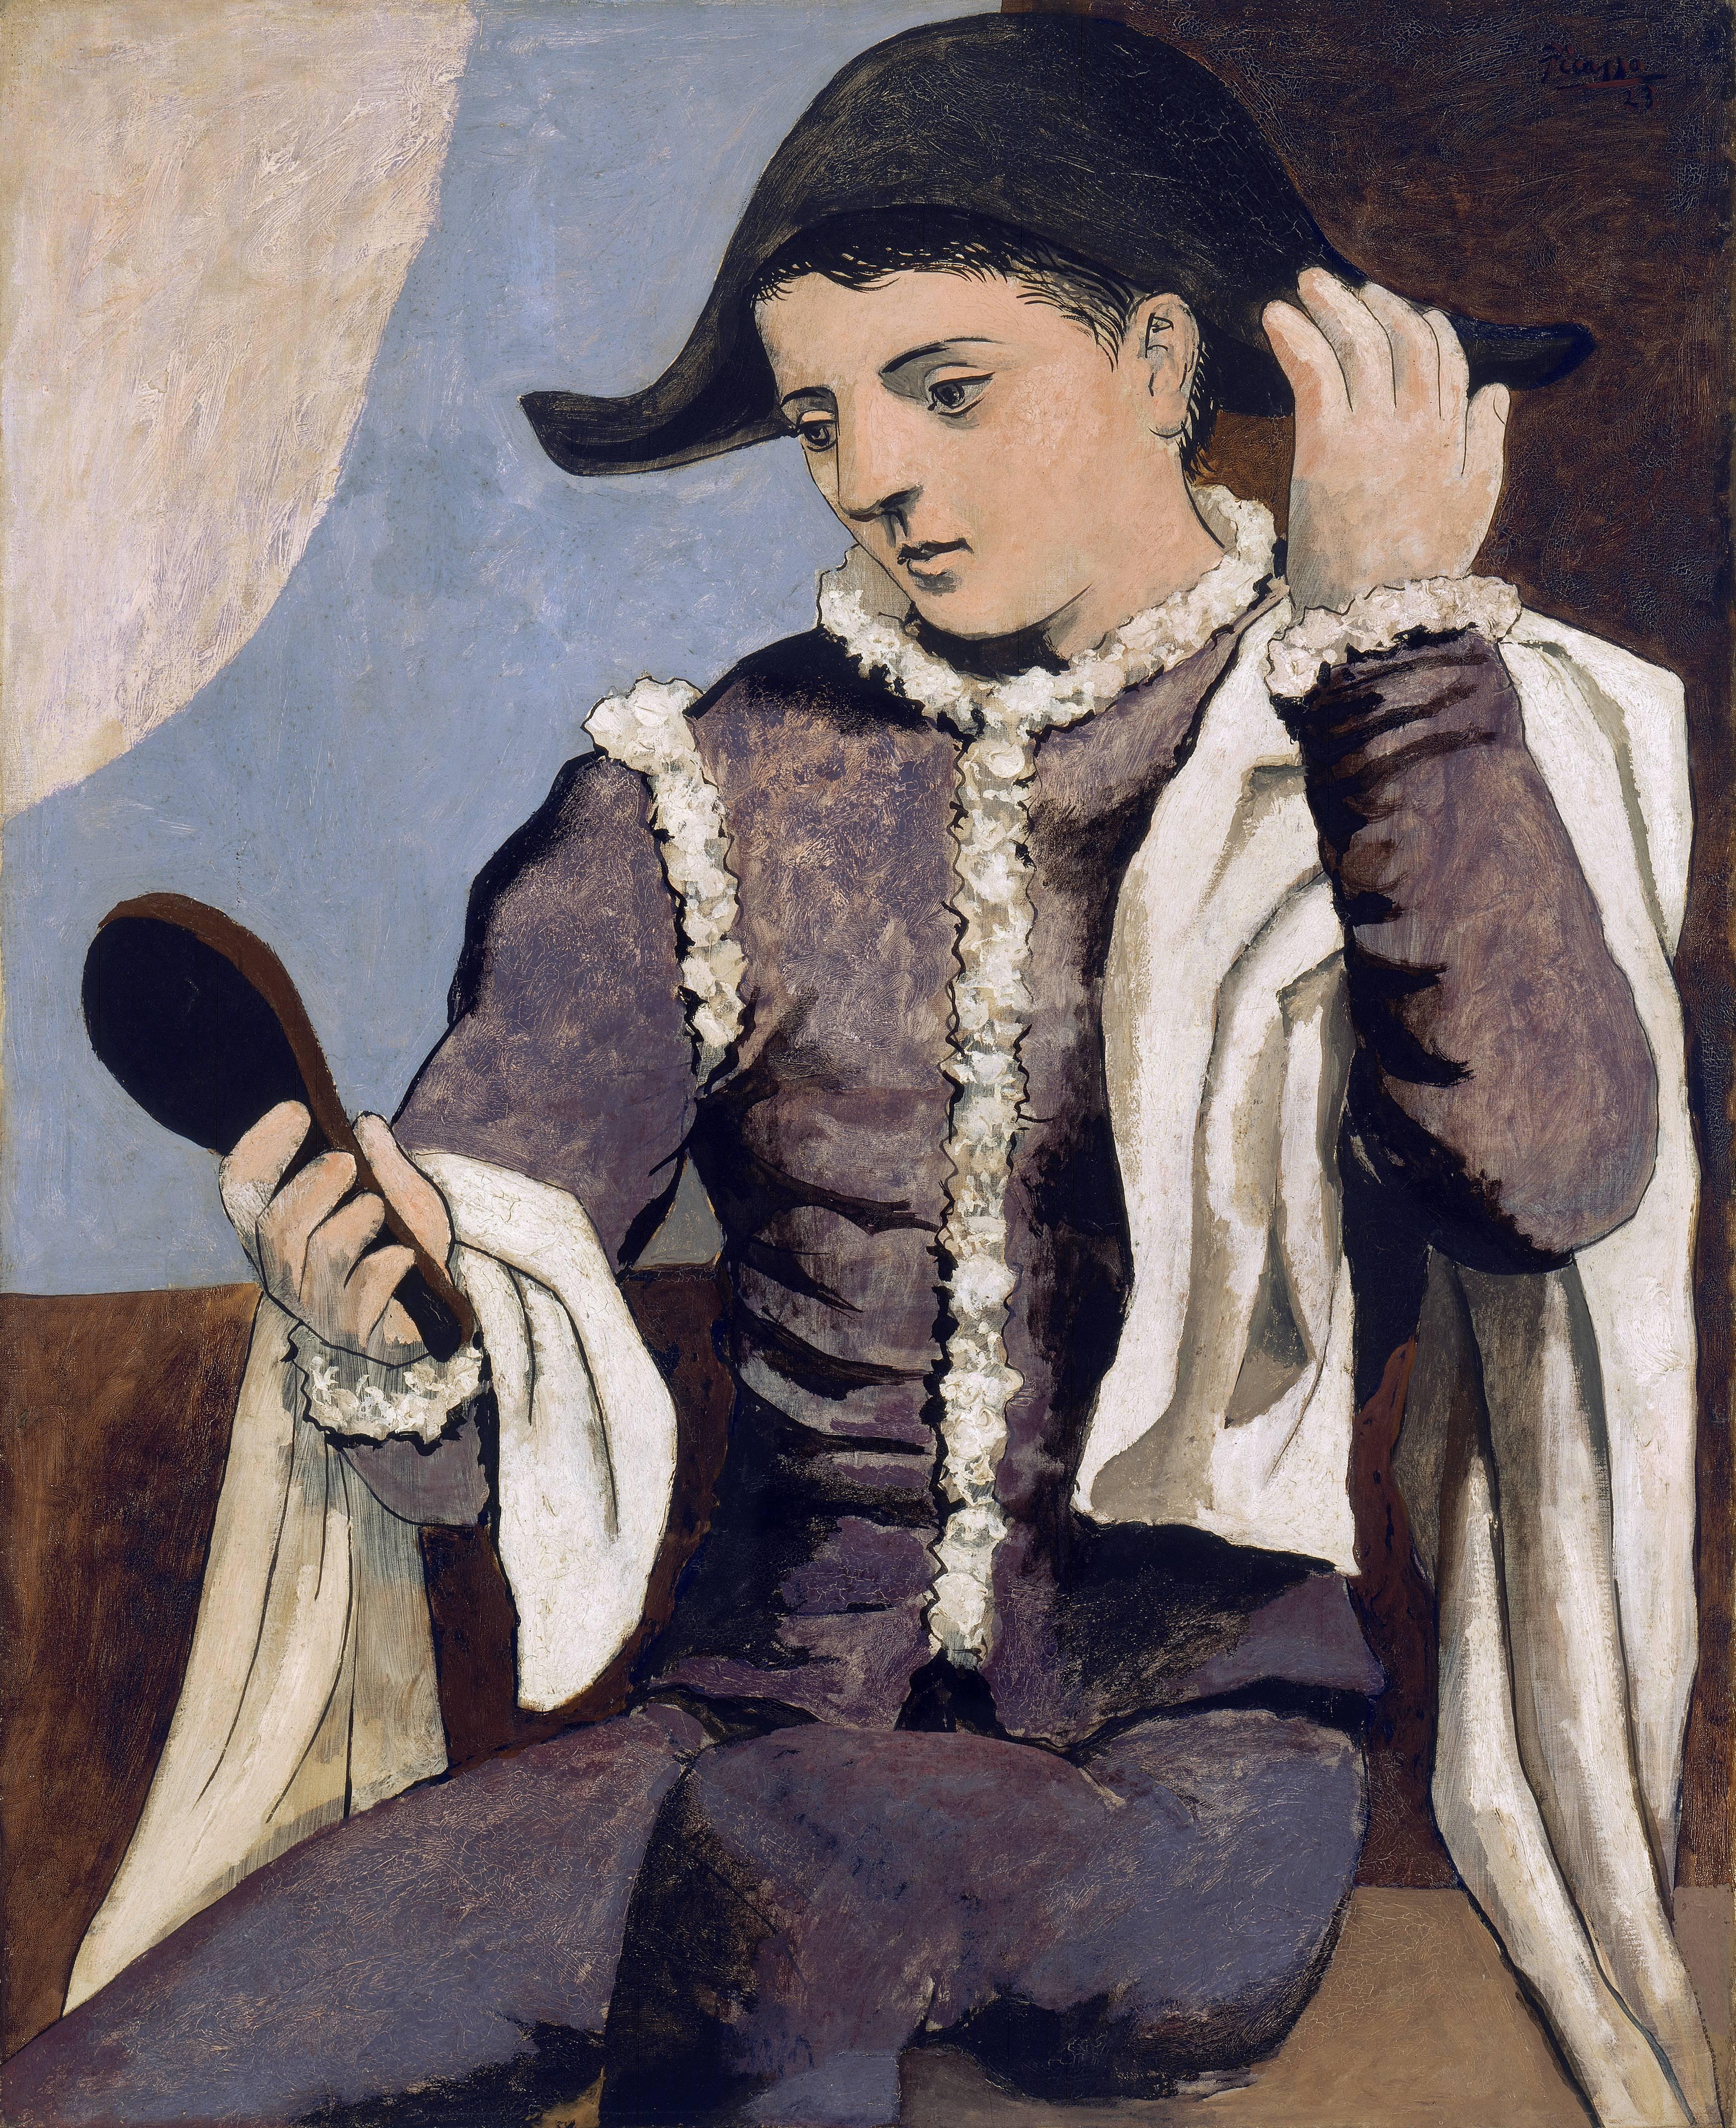 Pablo Ruiz Picasso Arlequín con espejo 1923 Óleo sobre lienzo. 100 x 81 cm Museo Thyssen-Bornemisza, Madrid © Sucesión Pablo Picasso, VEGAP, Madrid, 2016